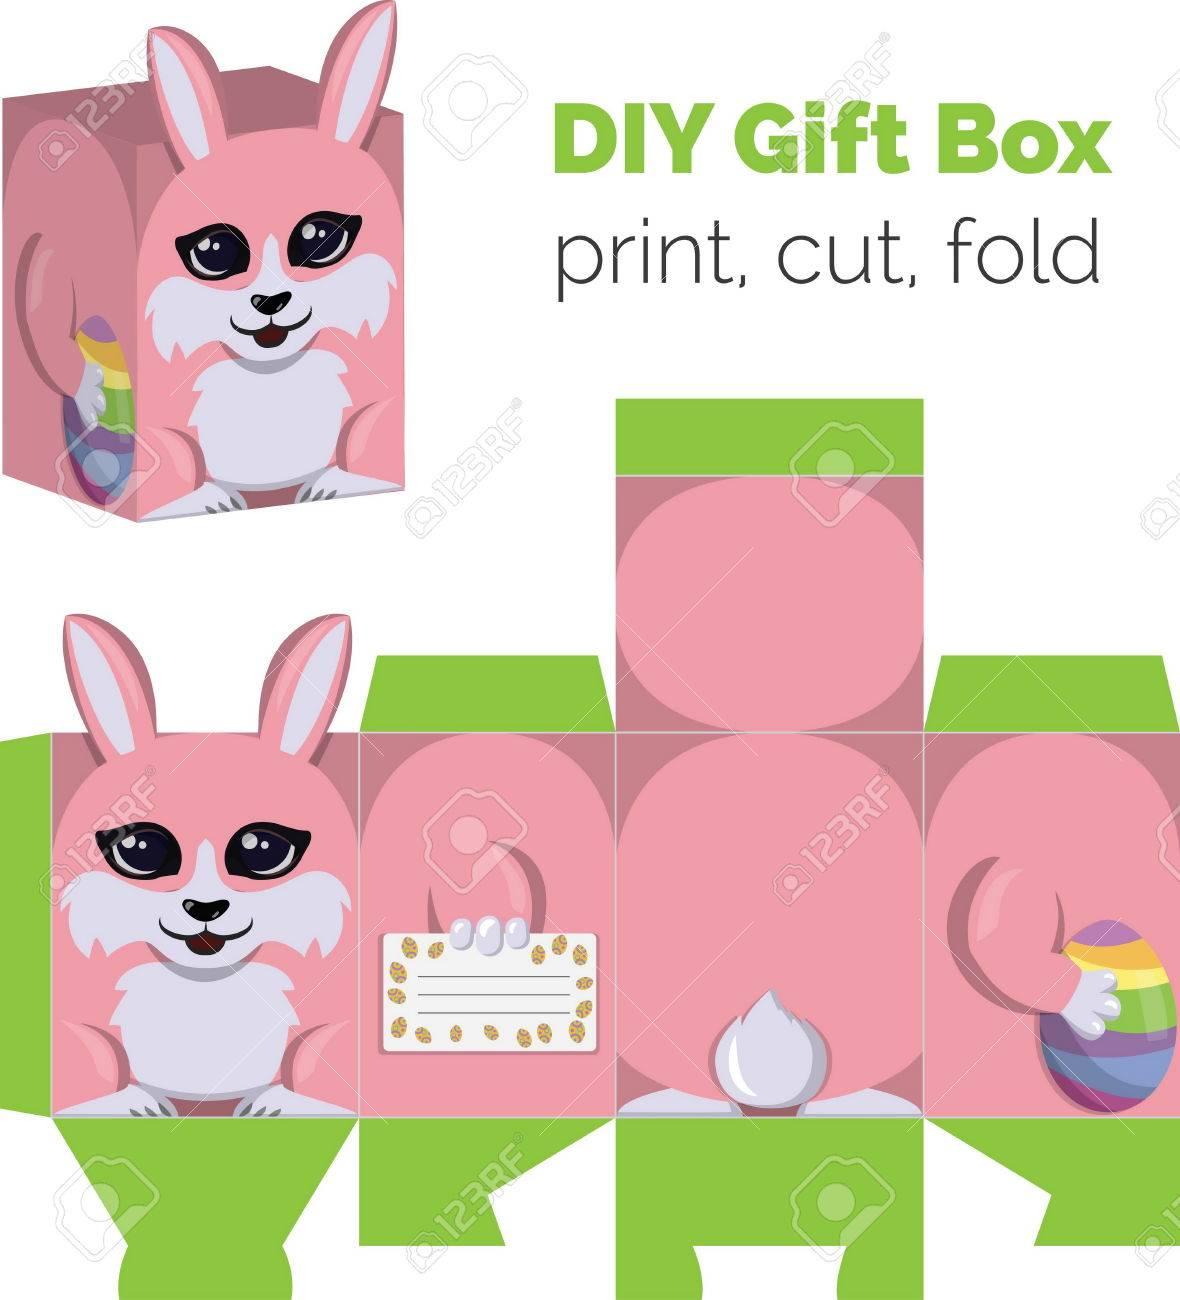 Adorable do it yourself diy easter bunny with egg gift box with adorable do it yourself diy easter bunny with egg gift box with ears for sweets solutioingenieria Choice Image